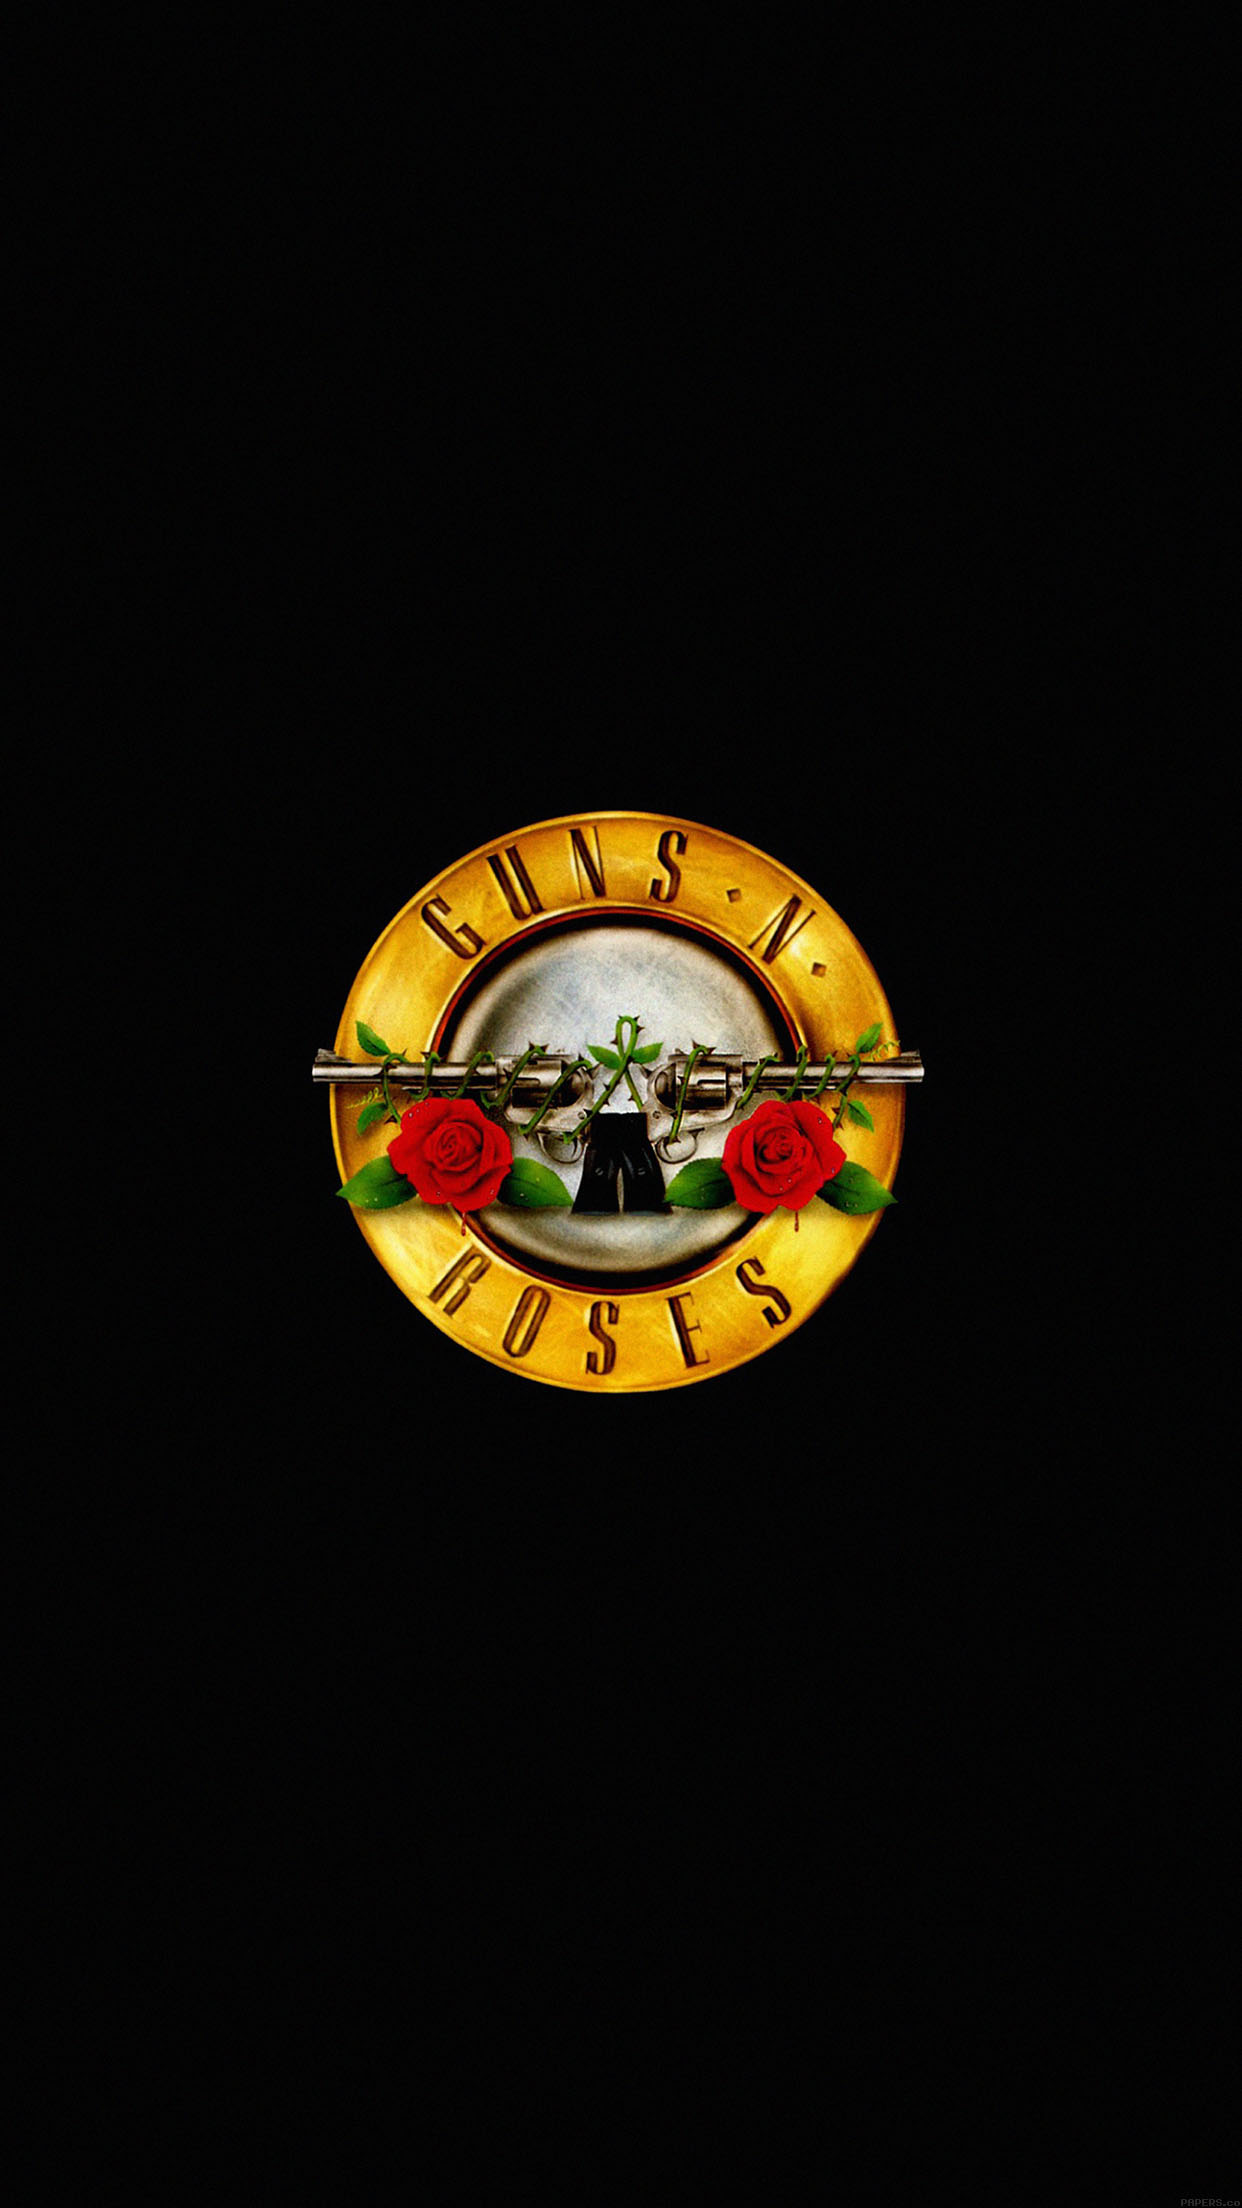 All Car Logo Wallpaper Download Papers Co Iphone Wallpaper Ac74 Wallpaper Guns N Roses